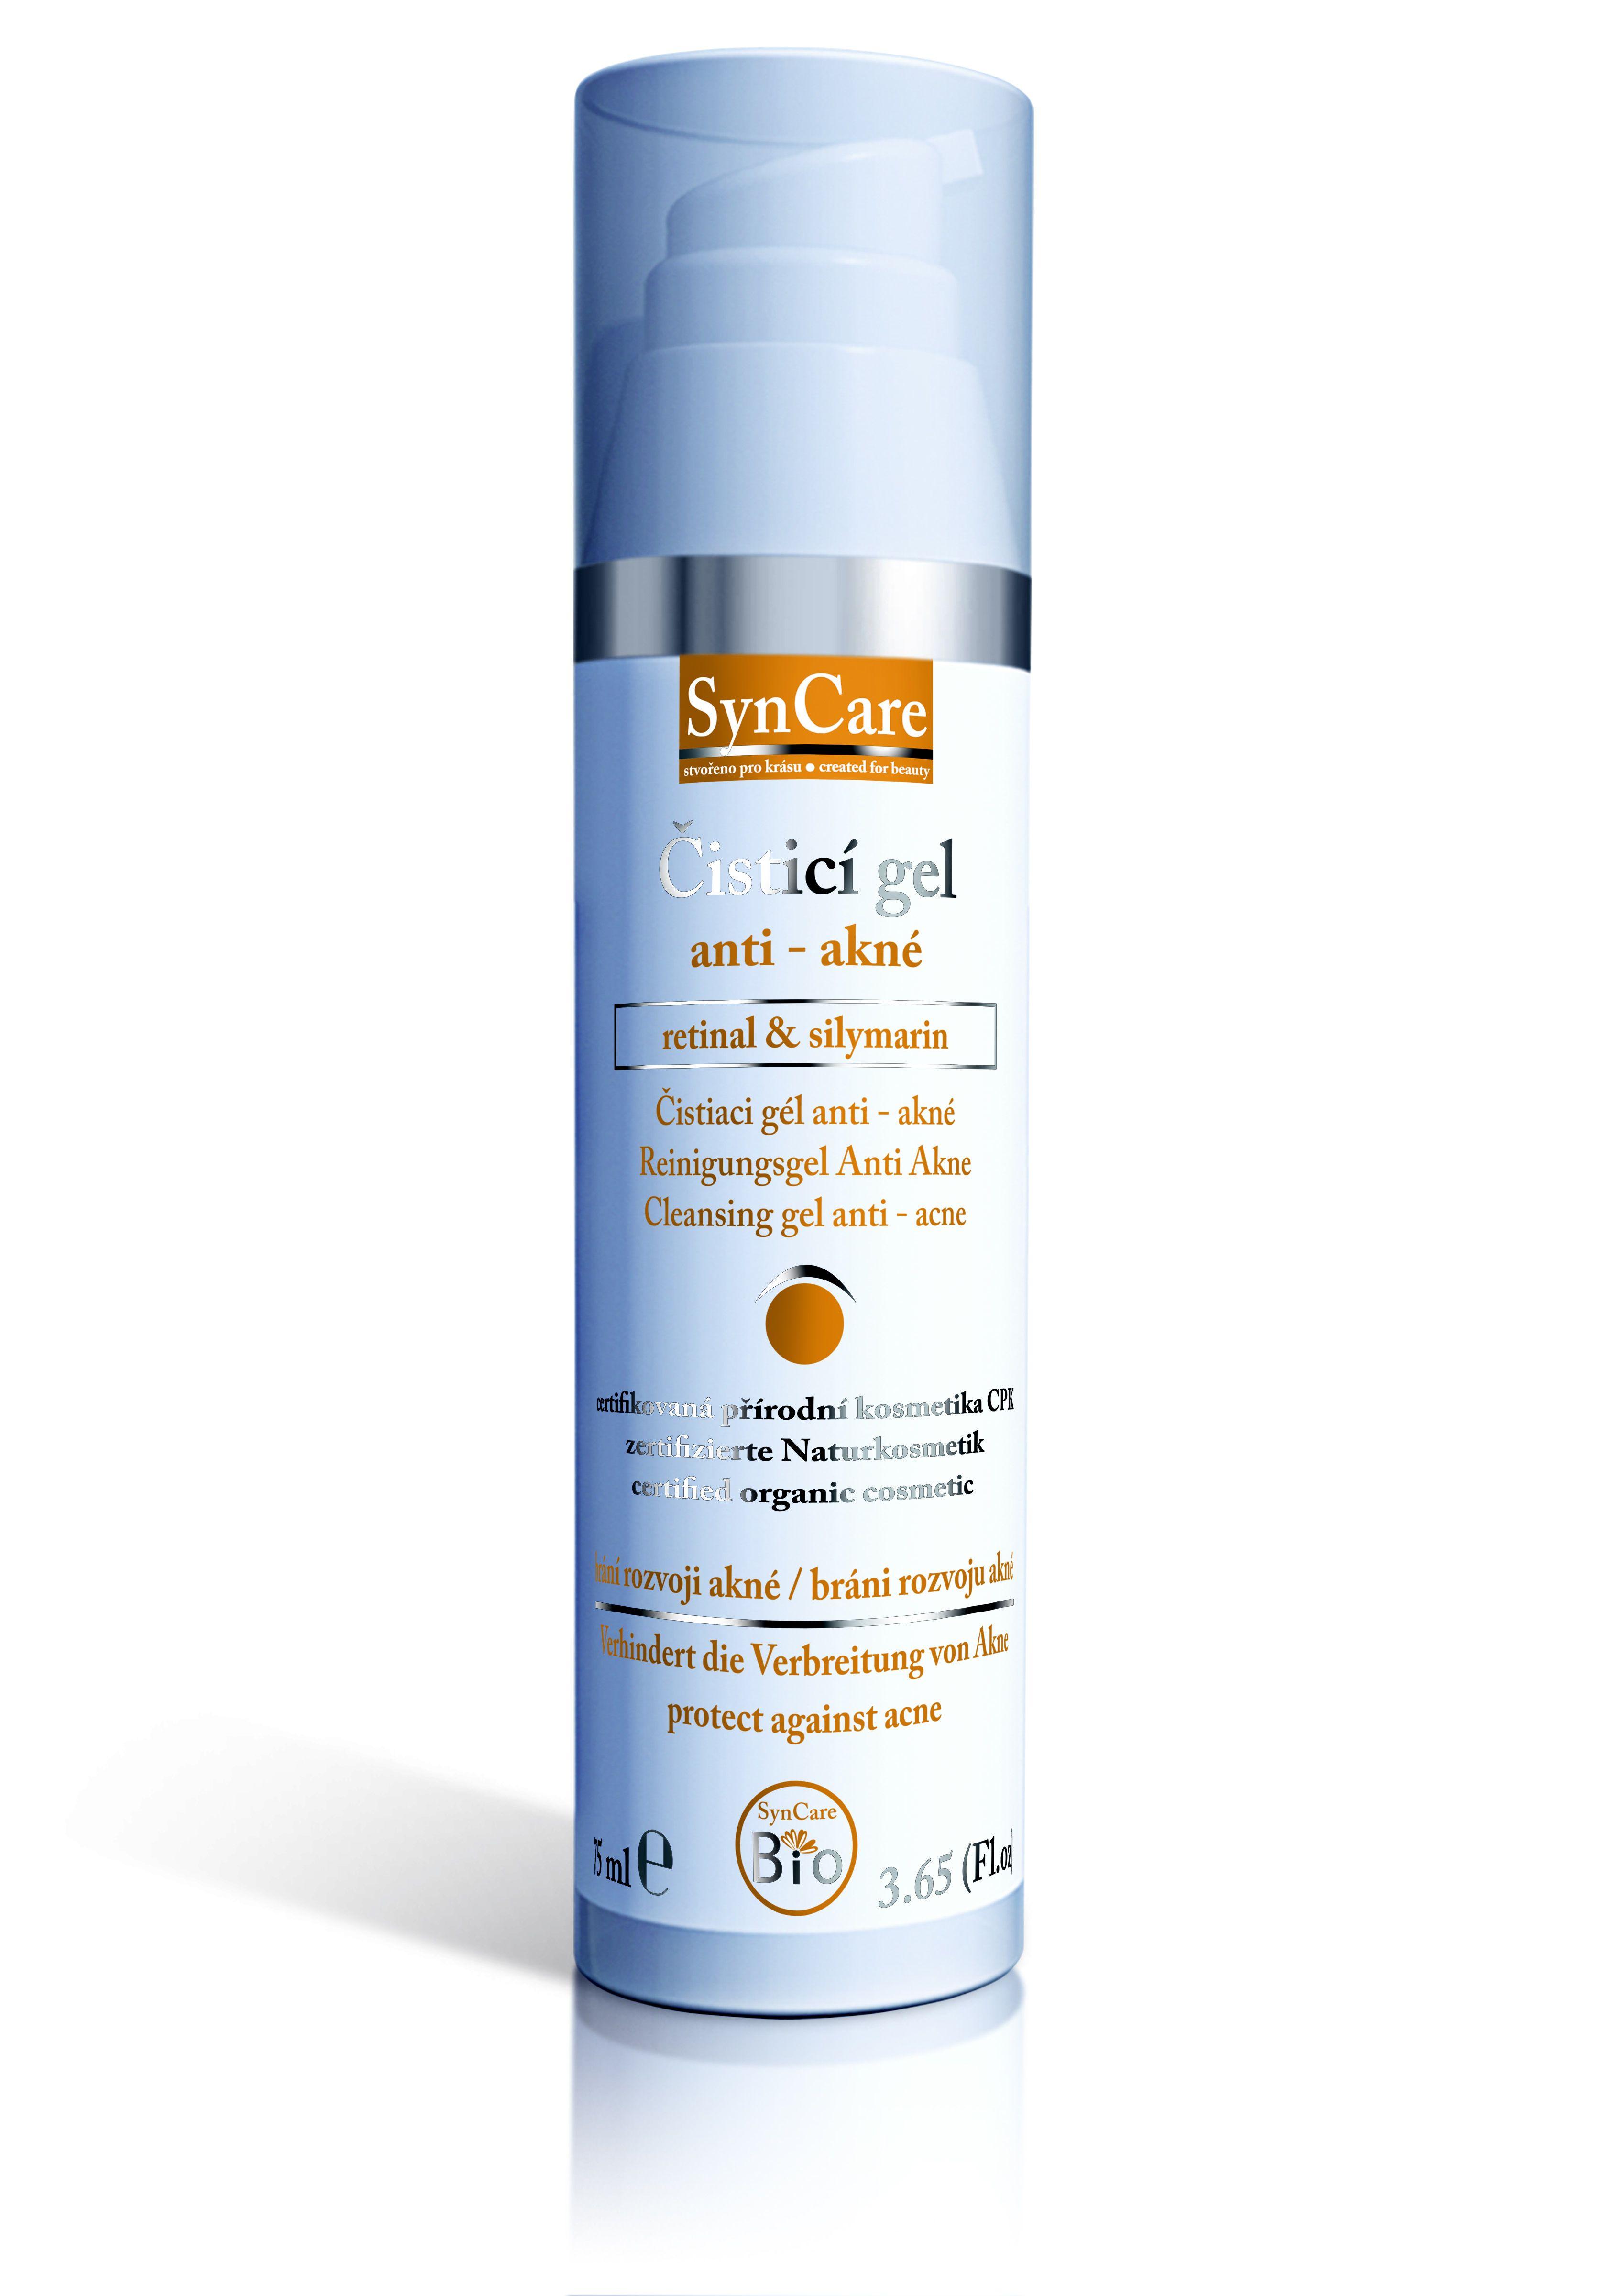 SynCare Čistící gel anti-akné 75 ml